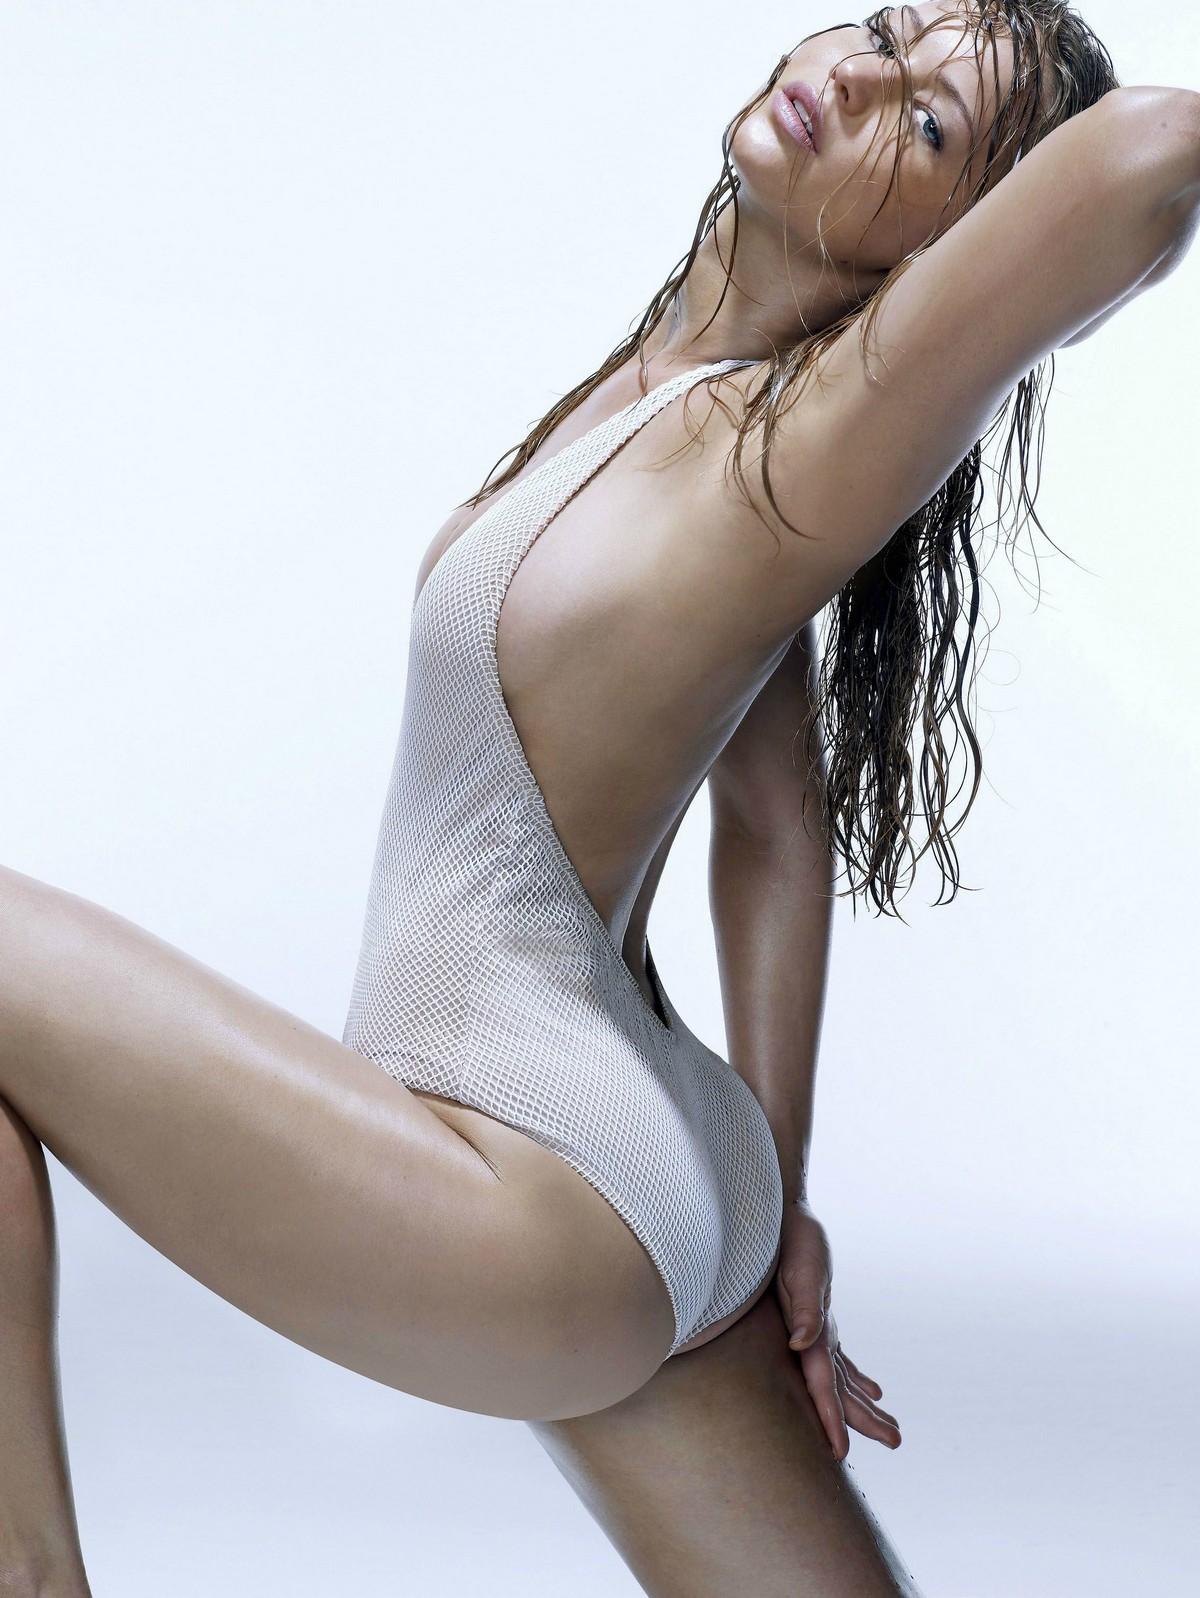 ver pelicula eroticas online gratis